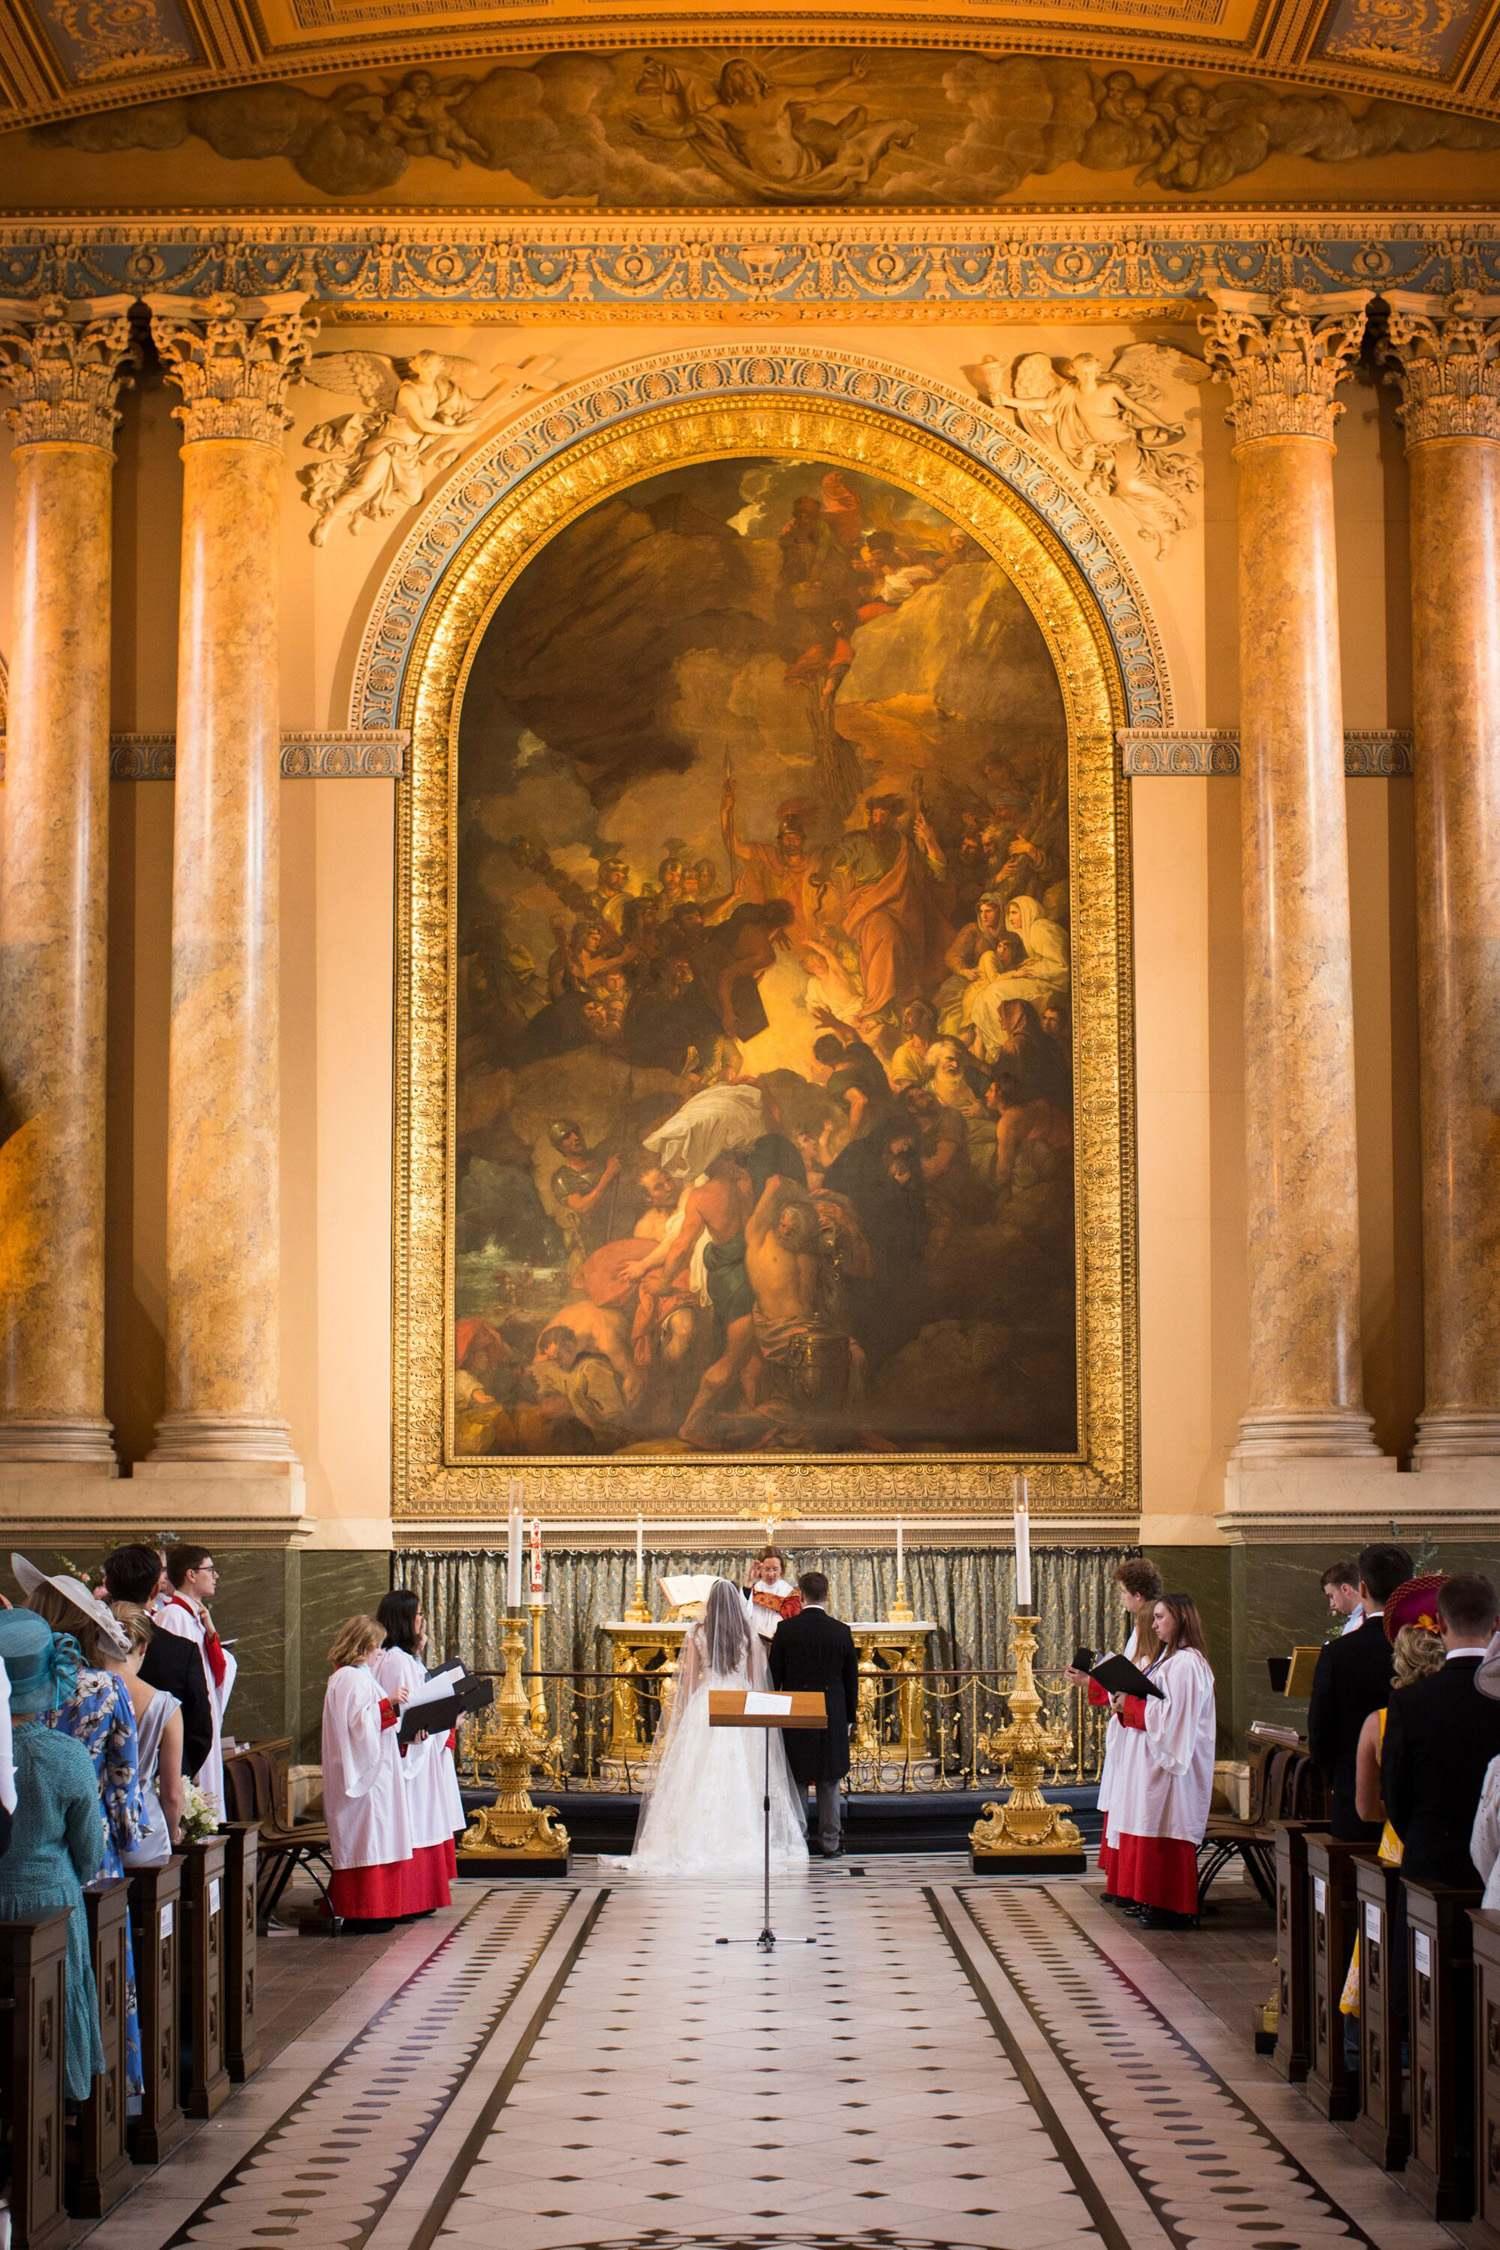 Littleton-Rose-Natural-History-Museum-London-Wedding-Planners-Royal-Naval-College-Chapel.jpg